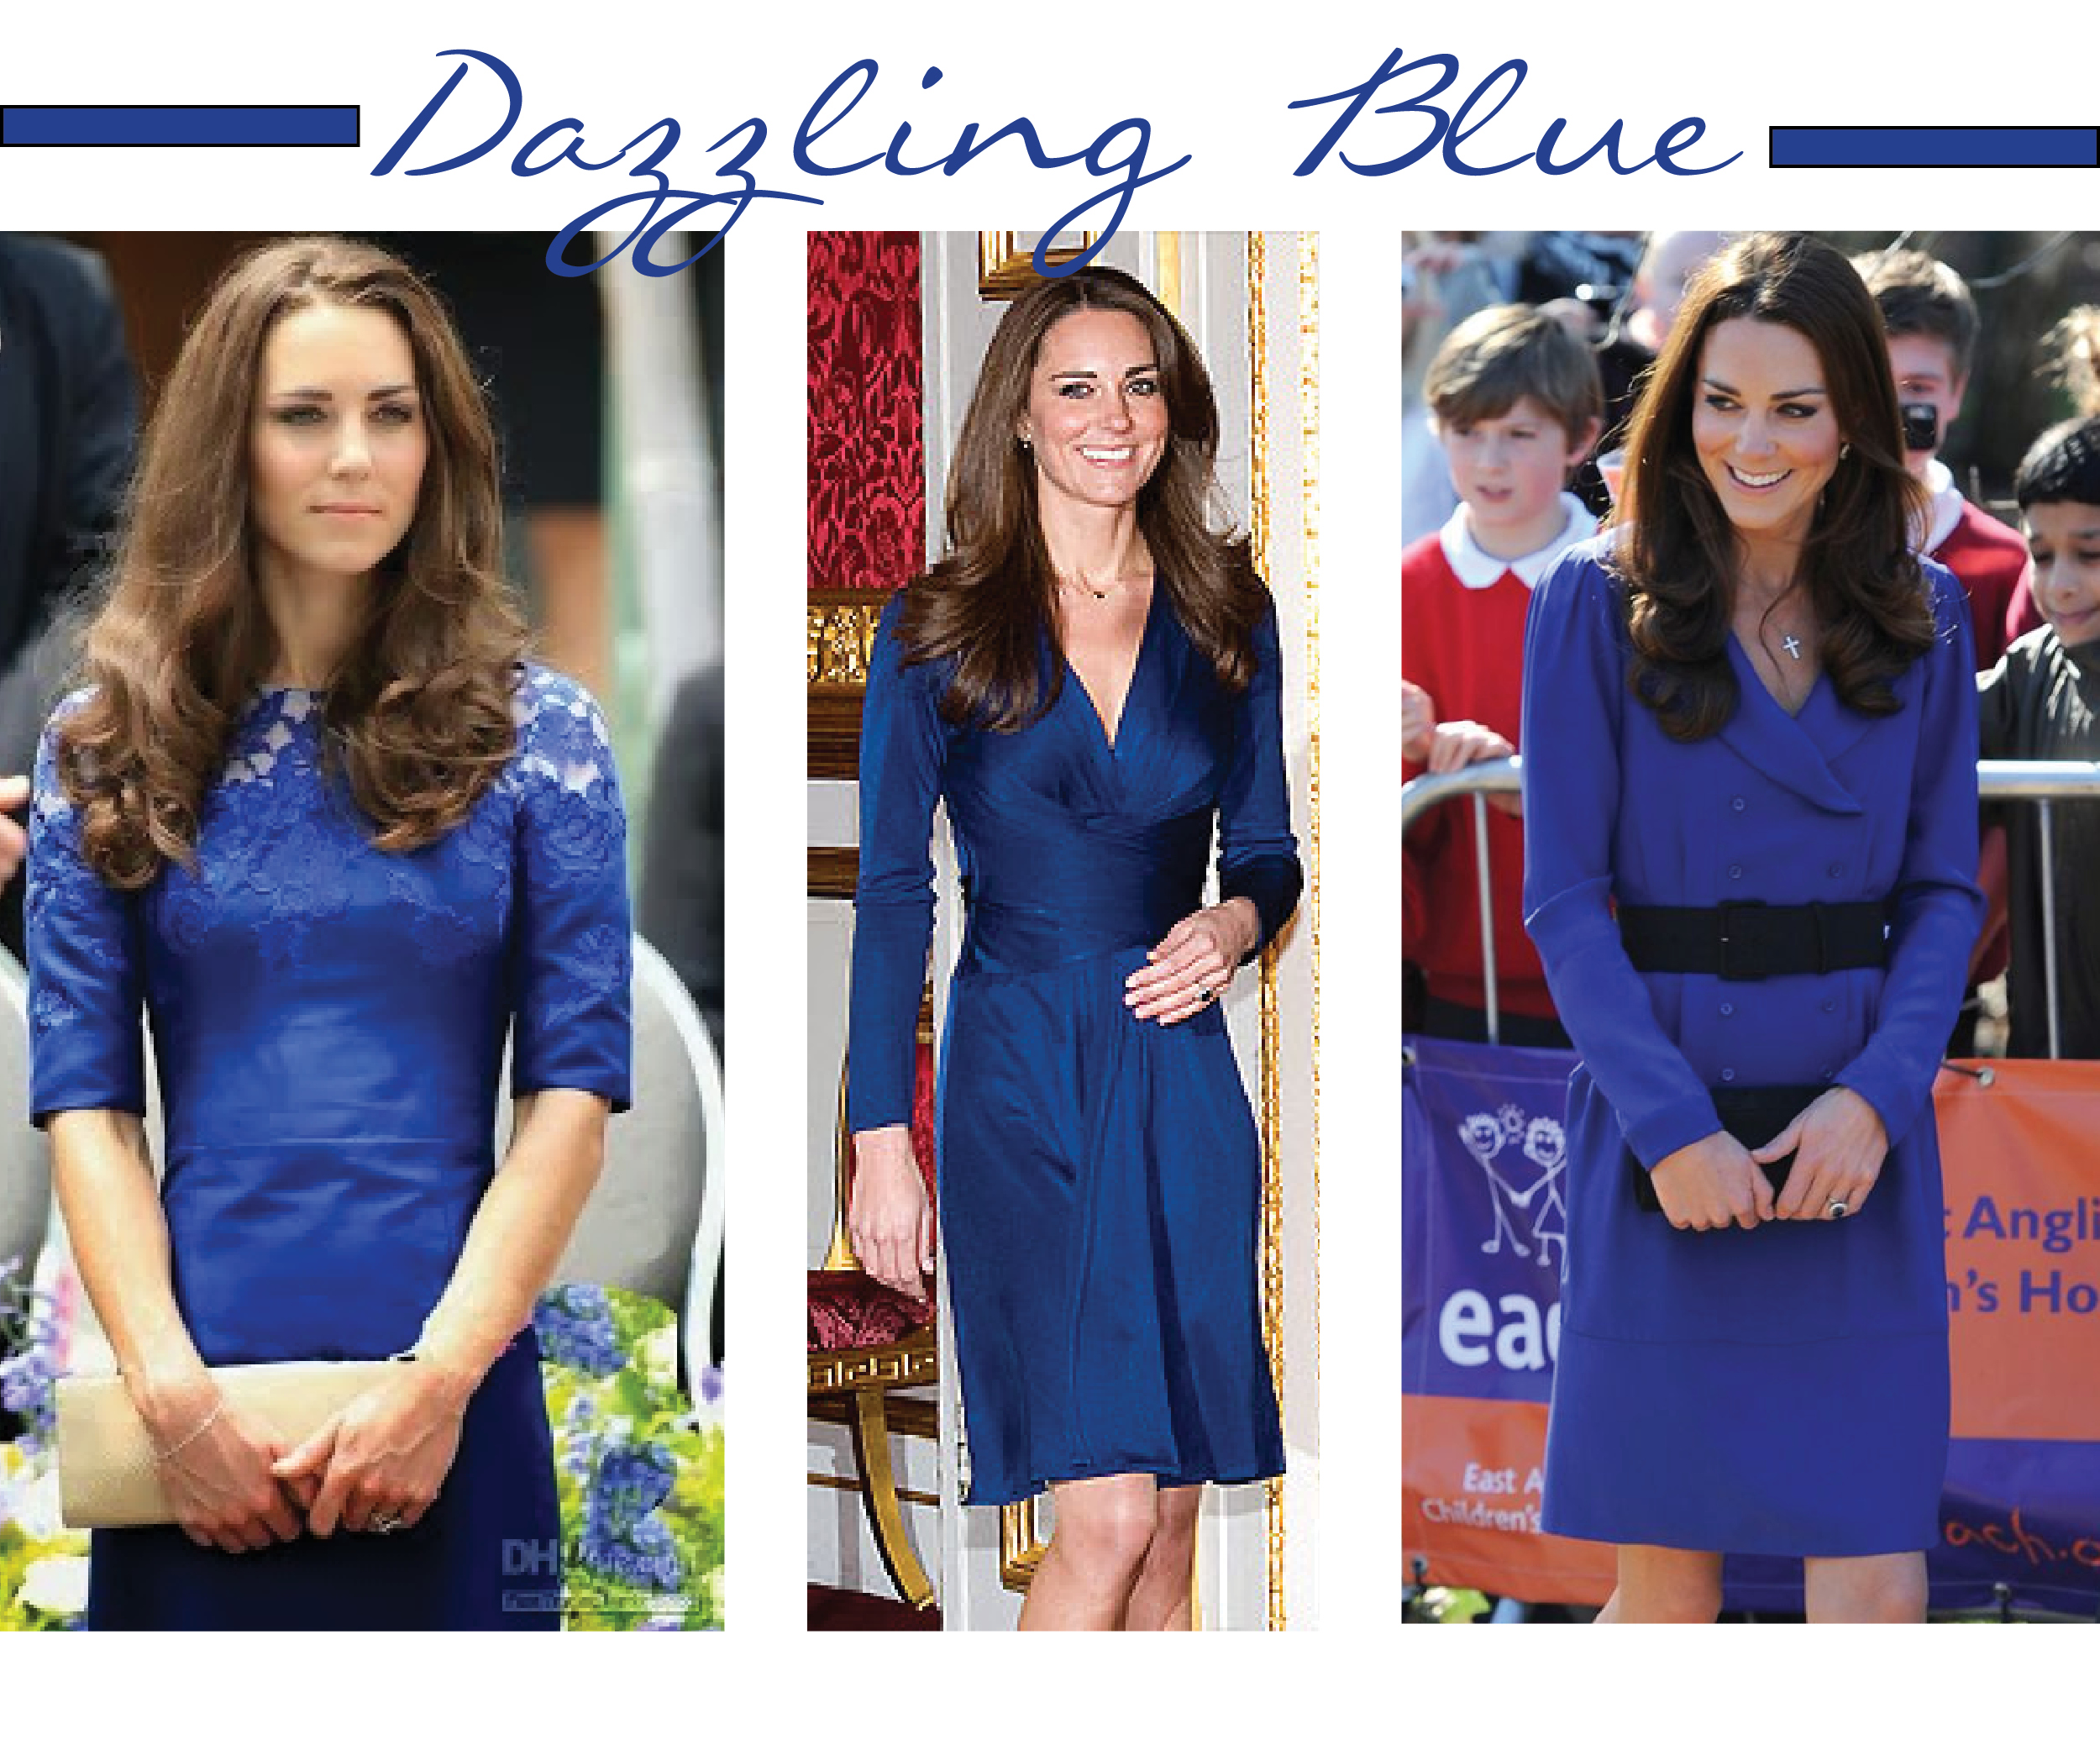 Dazzling Blue - kate middleton